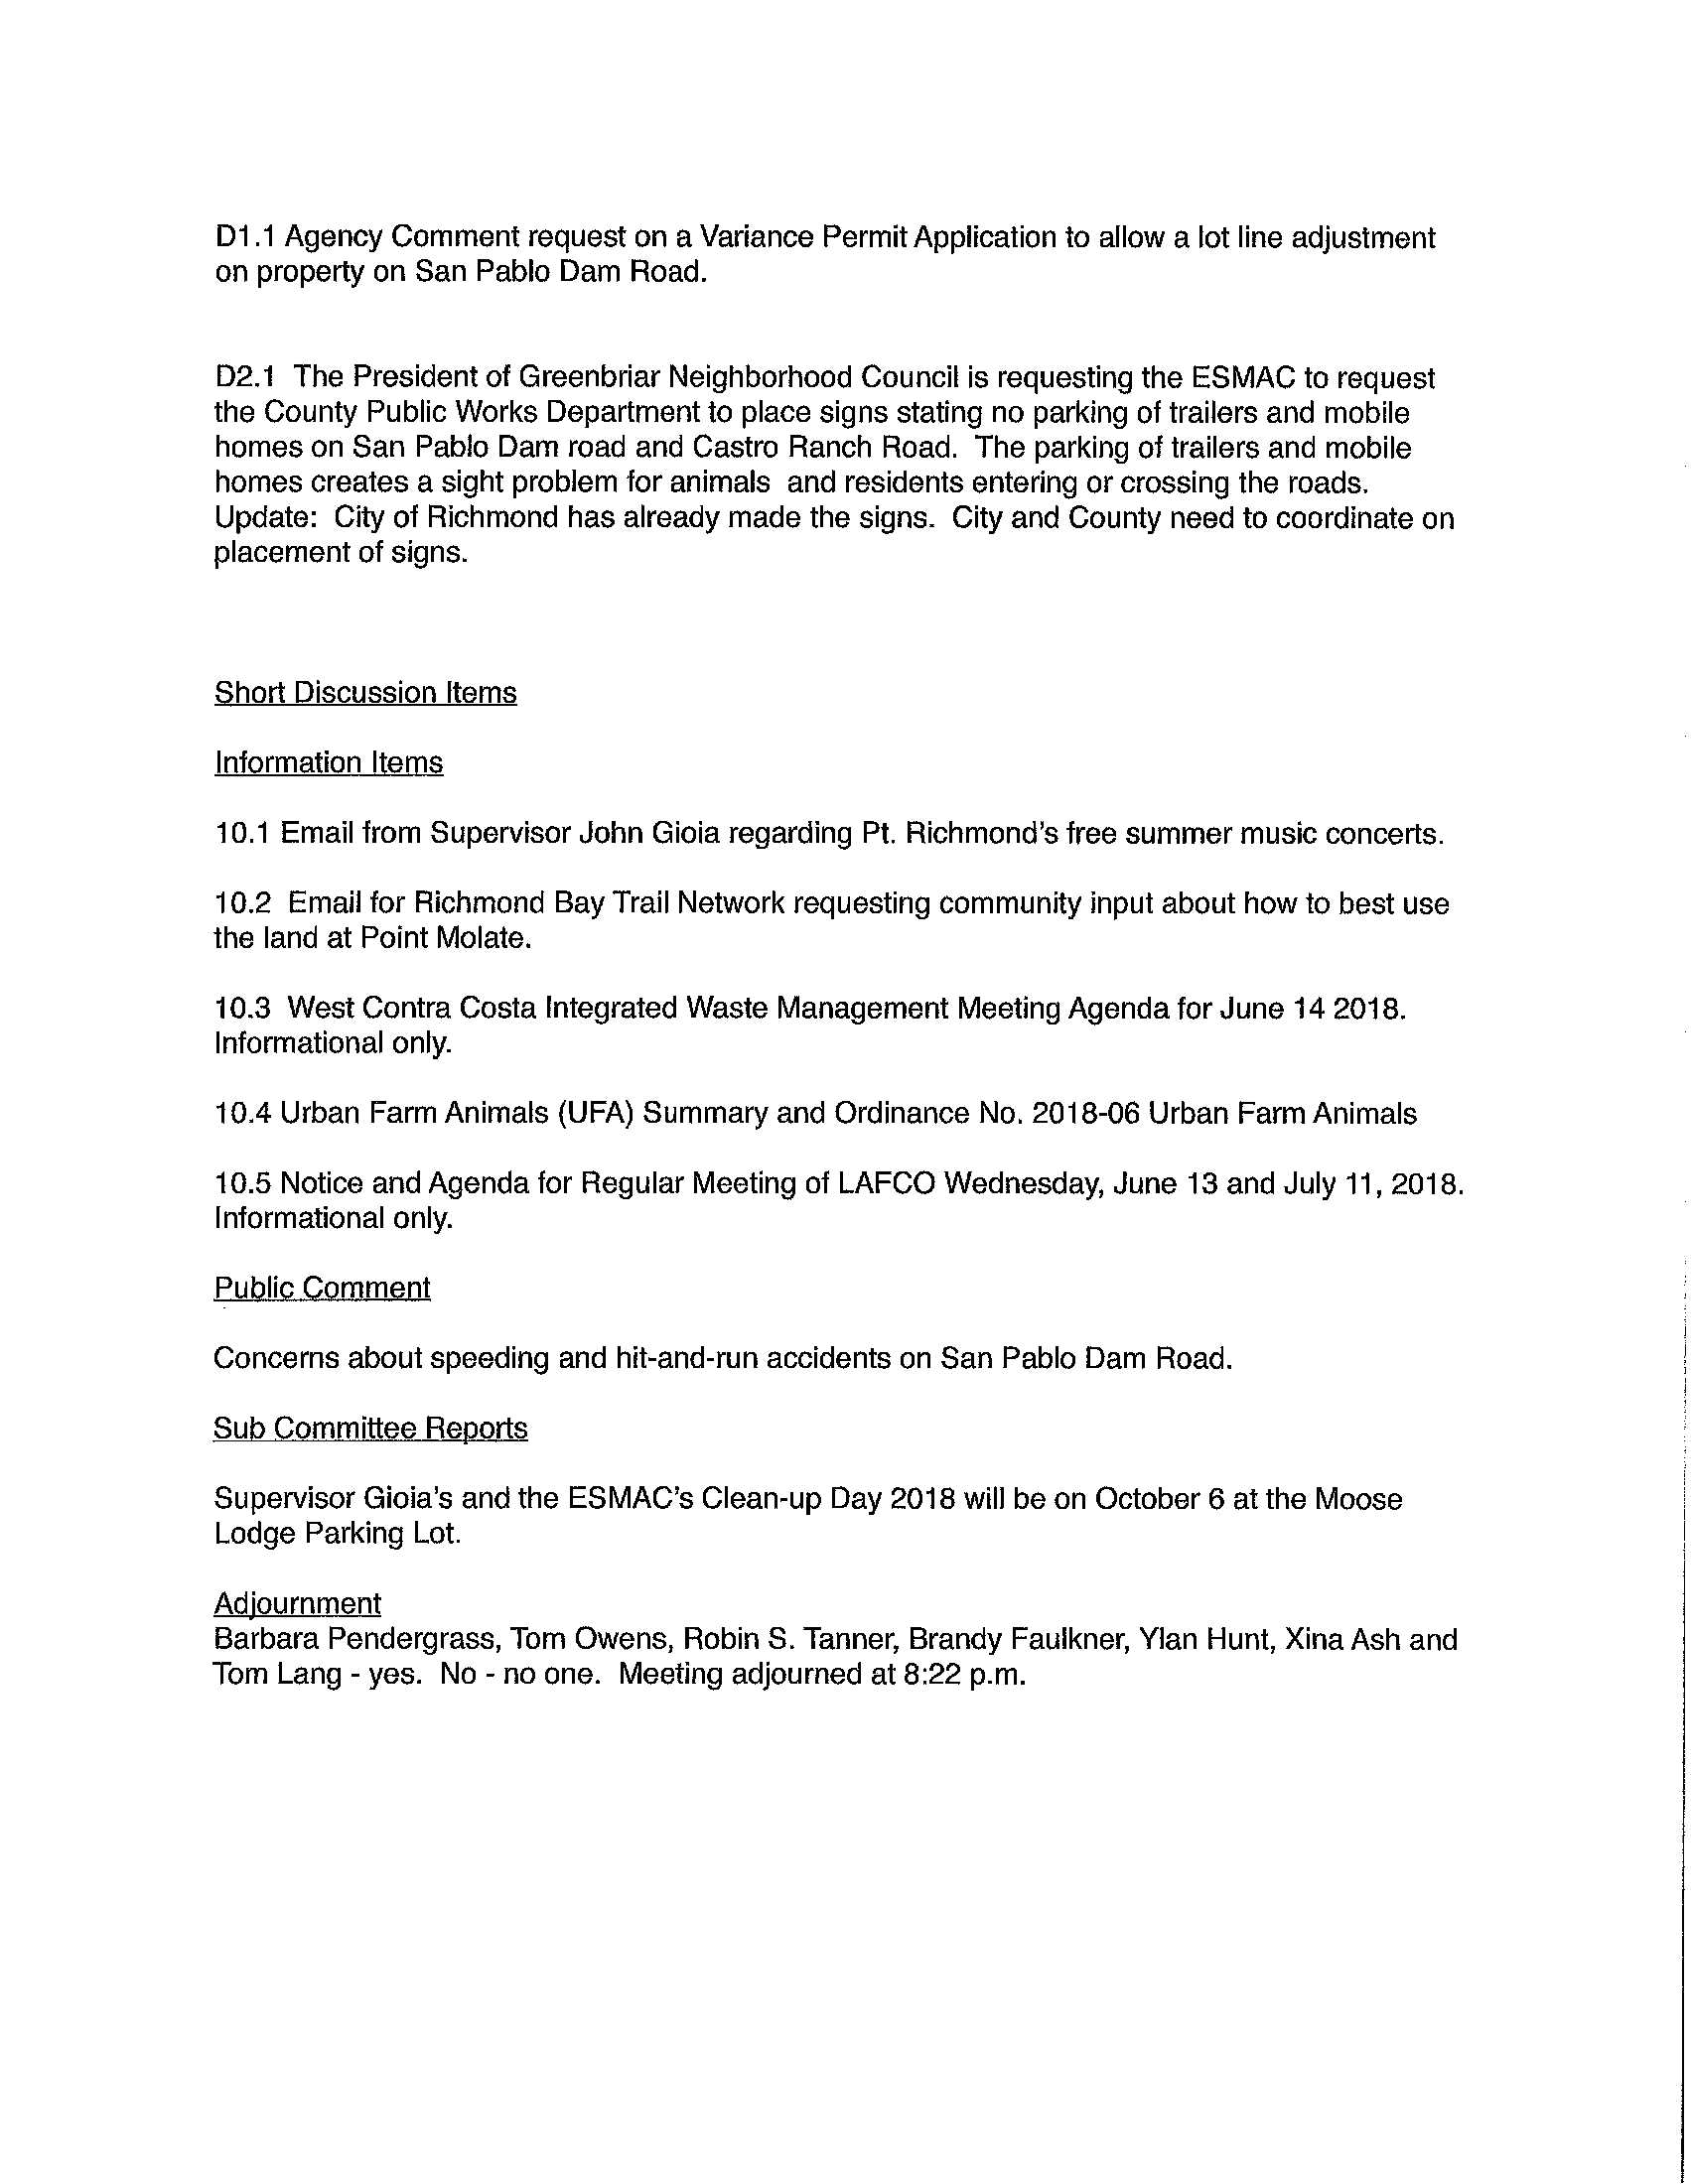 ESMAC Agenda 08.08.2018 (17 Pages)_4.jpg